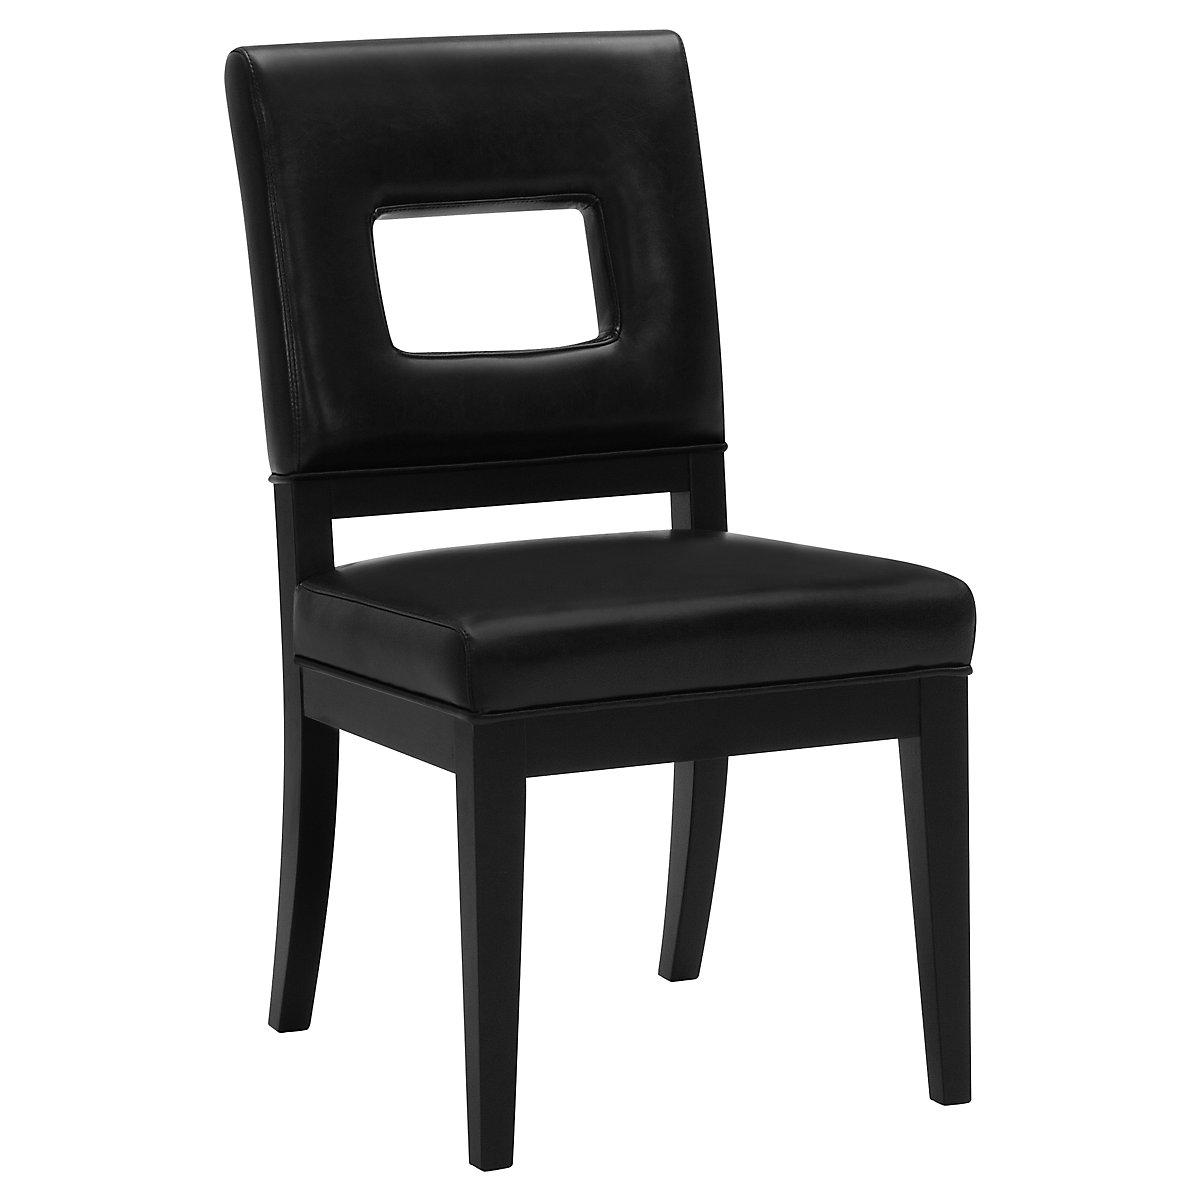 Aspen Black Bonded Leather Side Chair